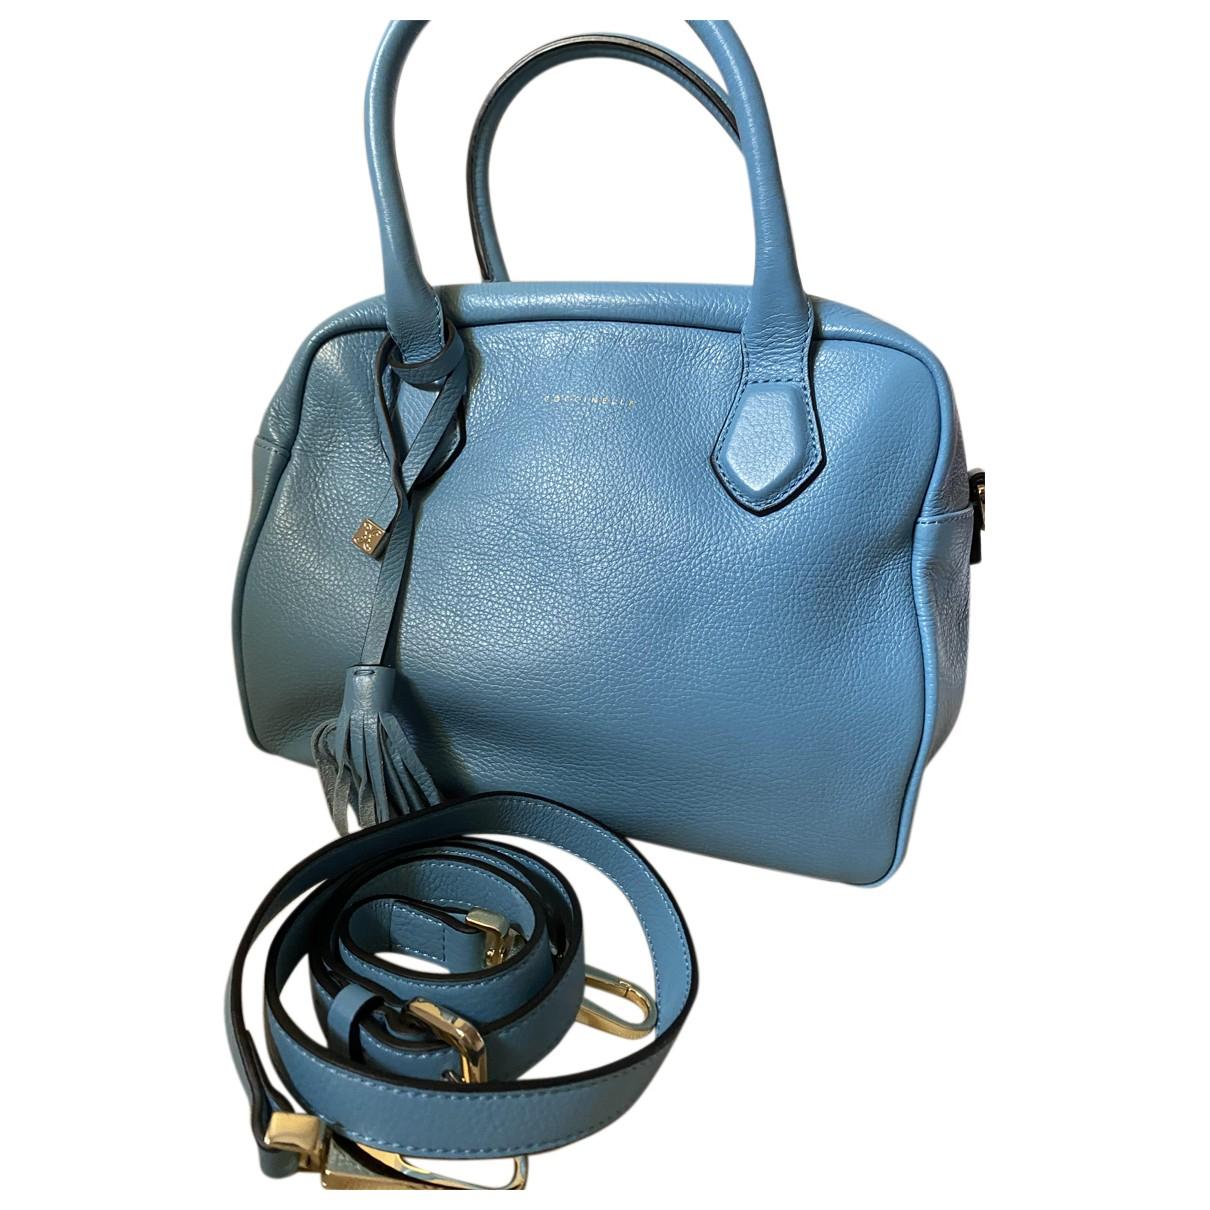 Coccinelle N Leather handbag for Women N